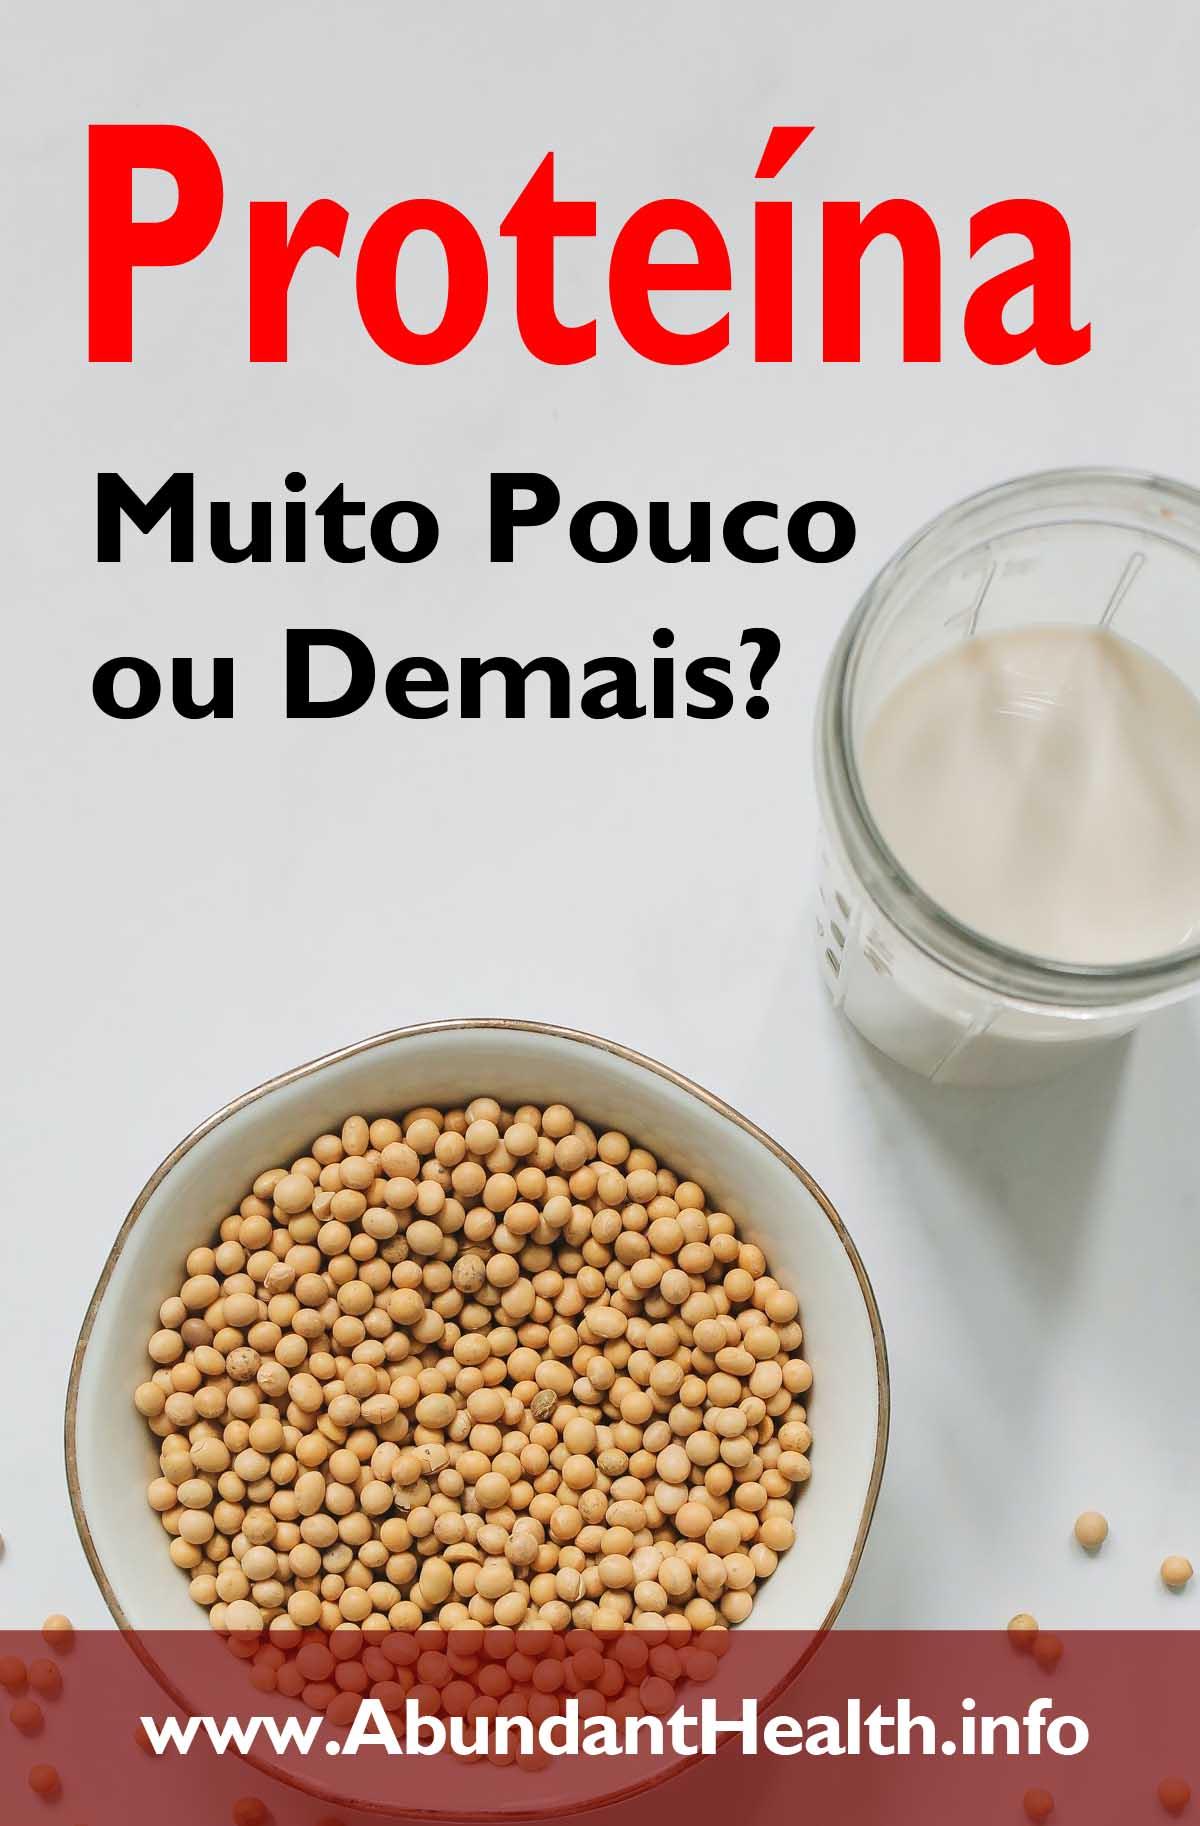 Proteína - Muito Pouco ou Demais?